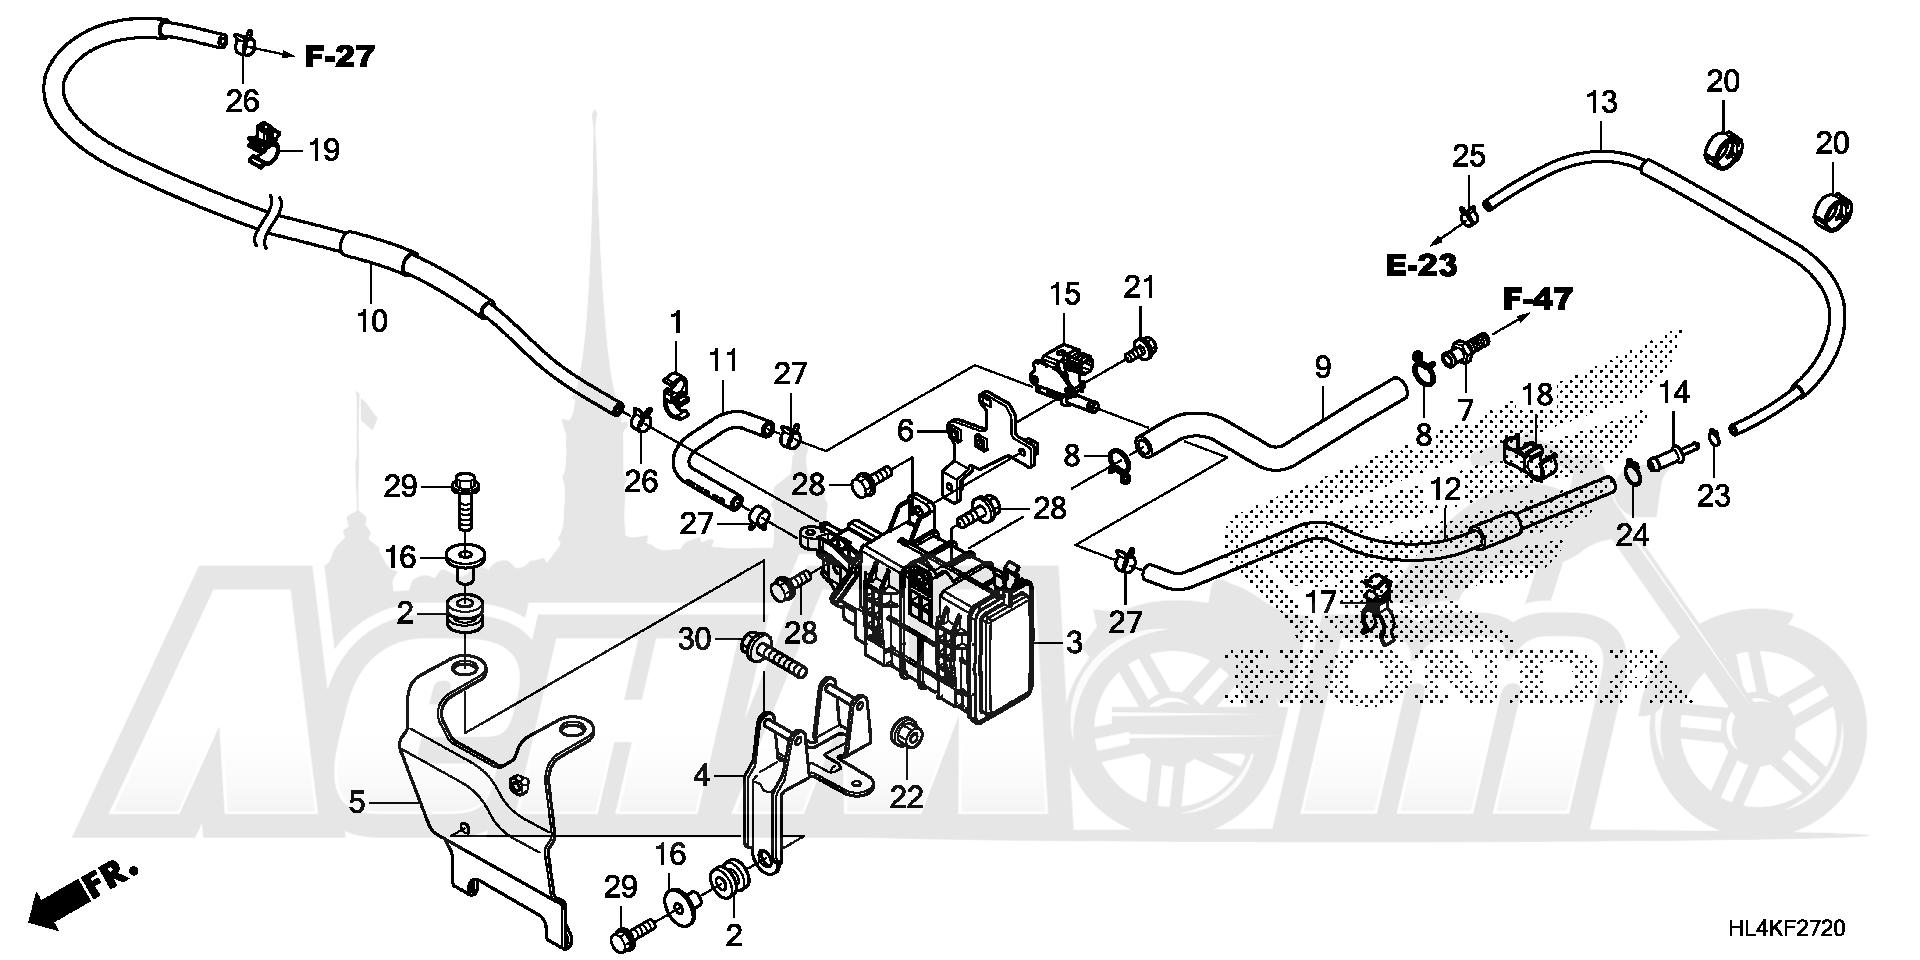 Запчасти для Квадроцикла Honda 2019 SXS1000M5P Раздел: EVAP CANISTER | EVAP канистра